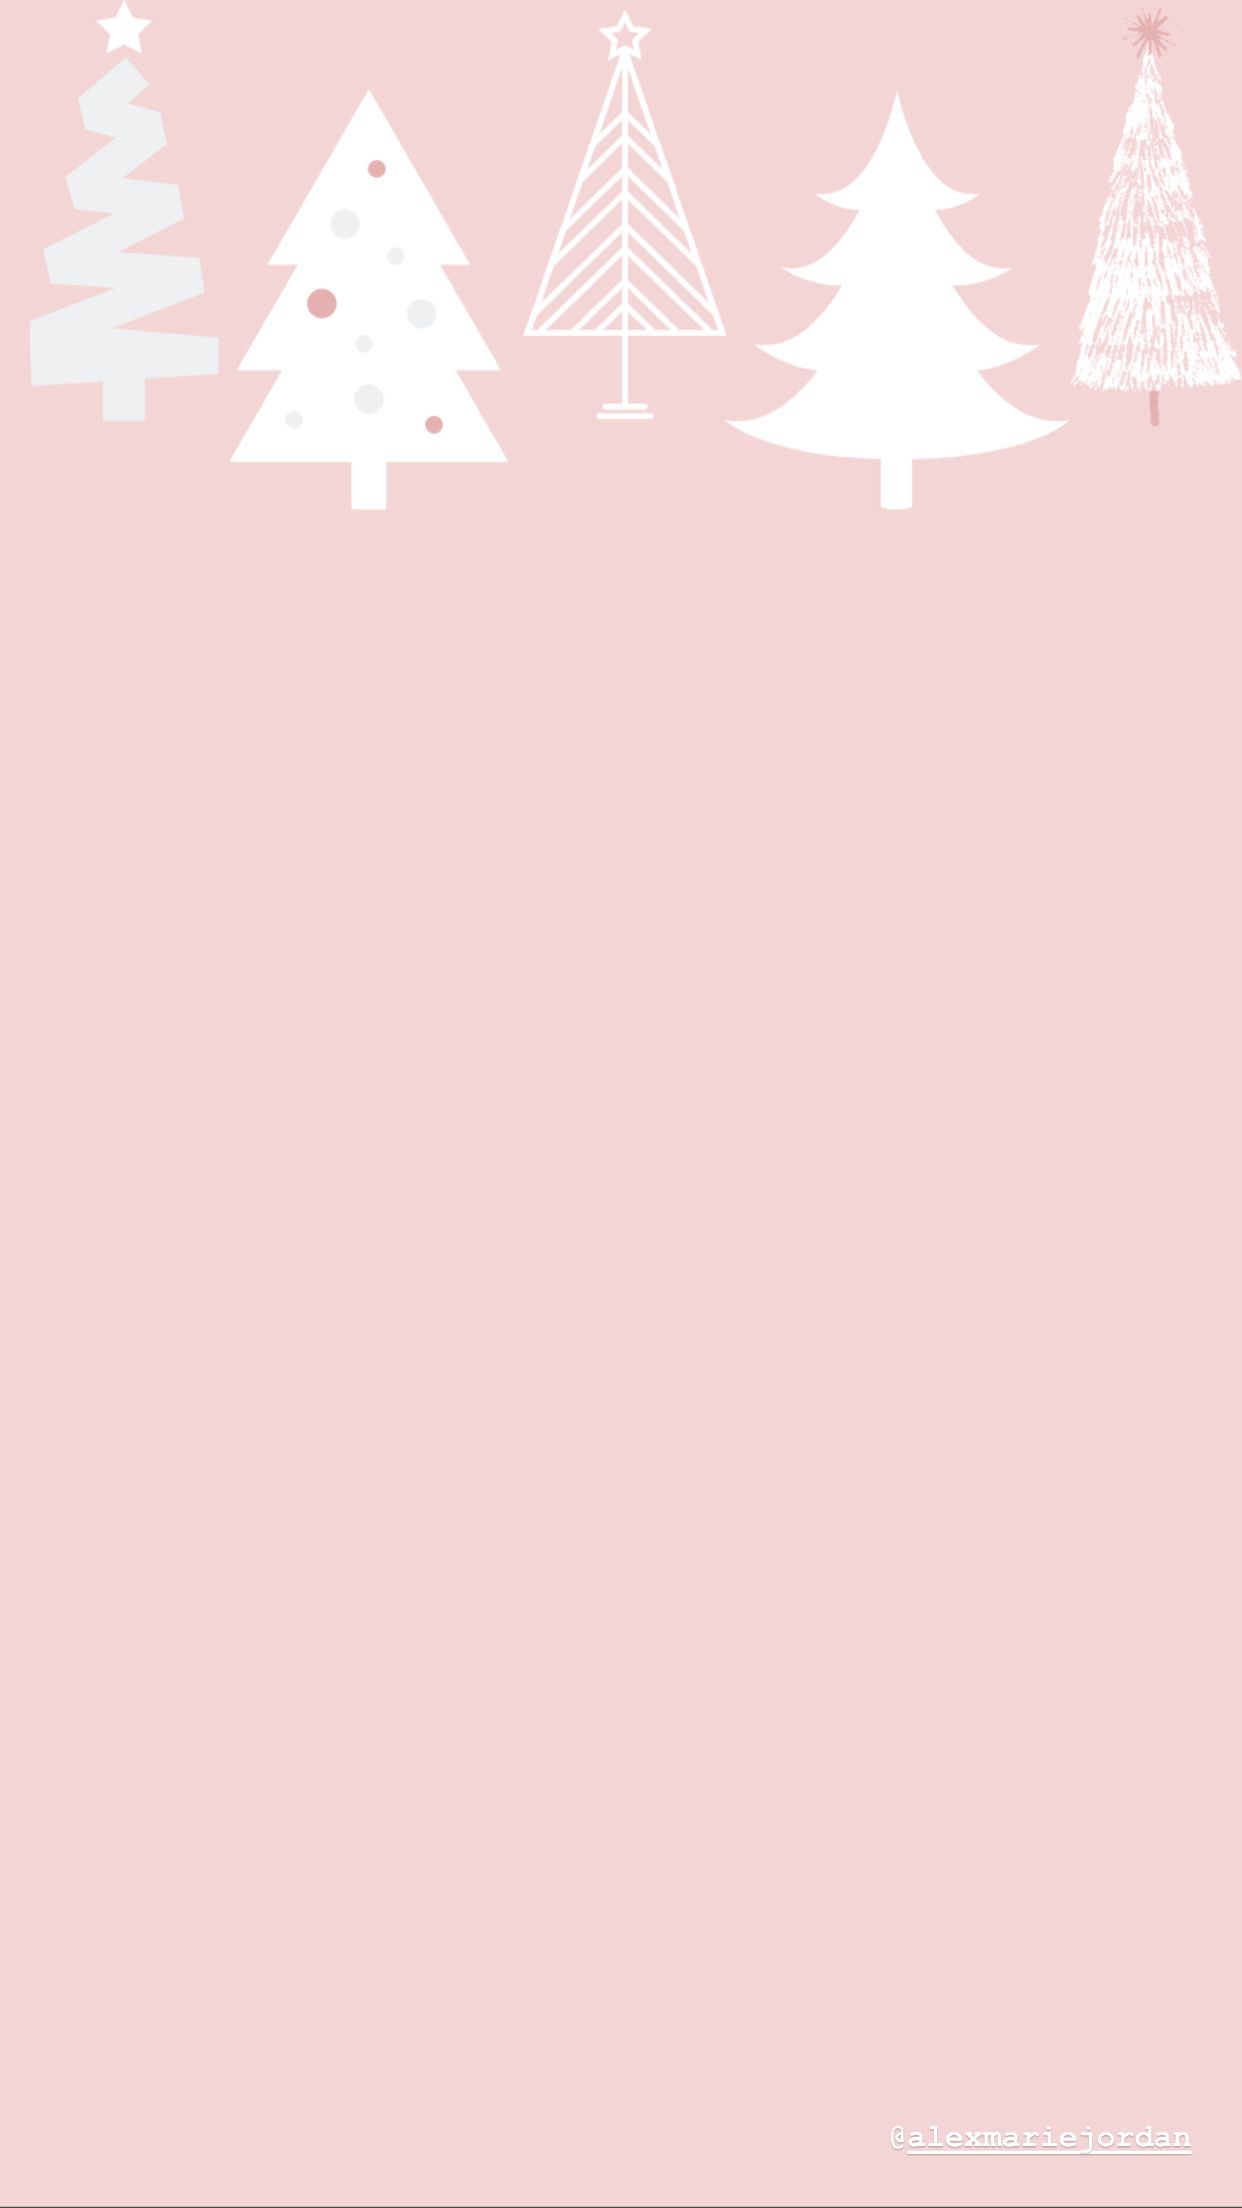 Pink Christmas Tree Wallpaper Xmas Wallpaper Wallpaper Iphone Christmas Christmas Phone Wallpaper